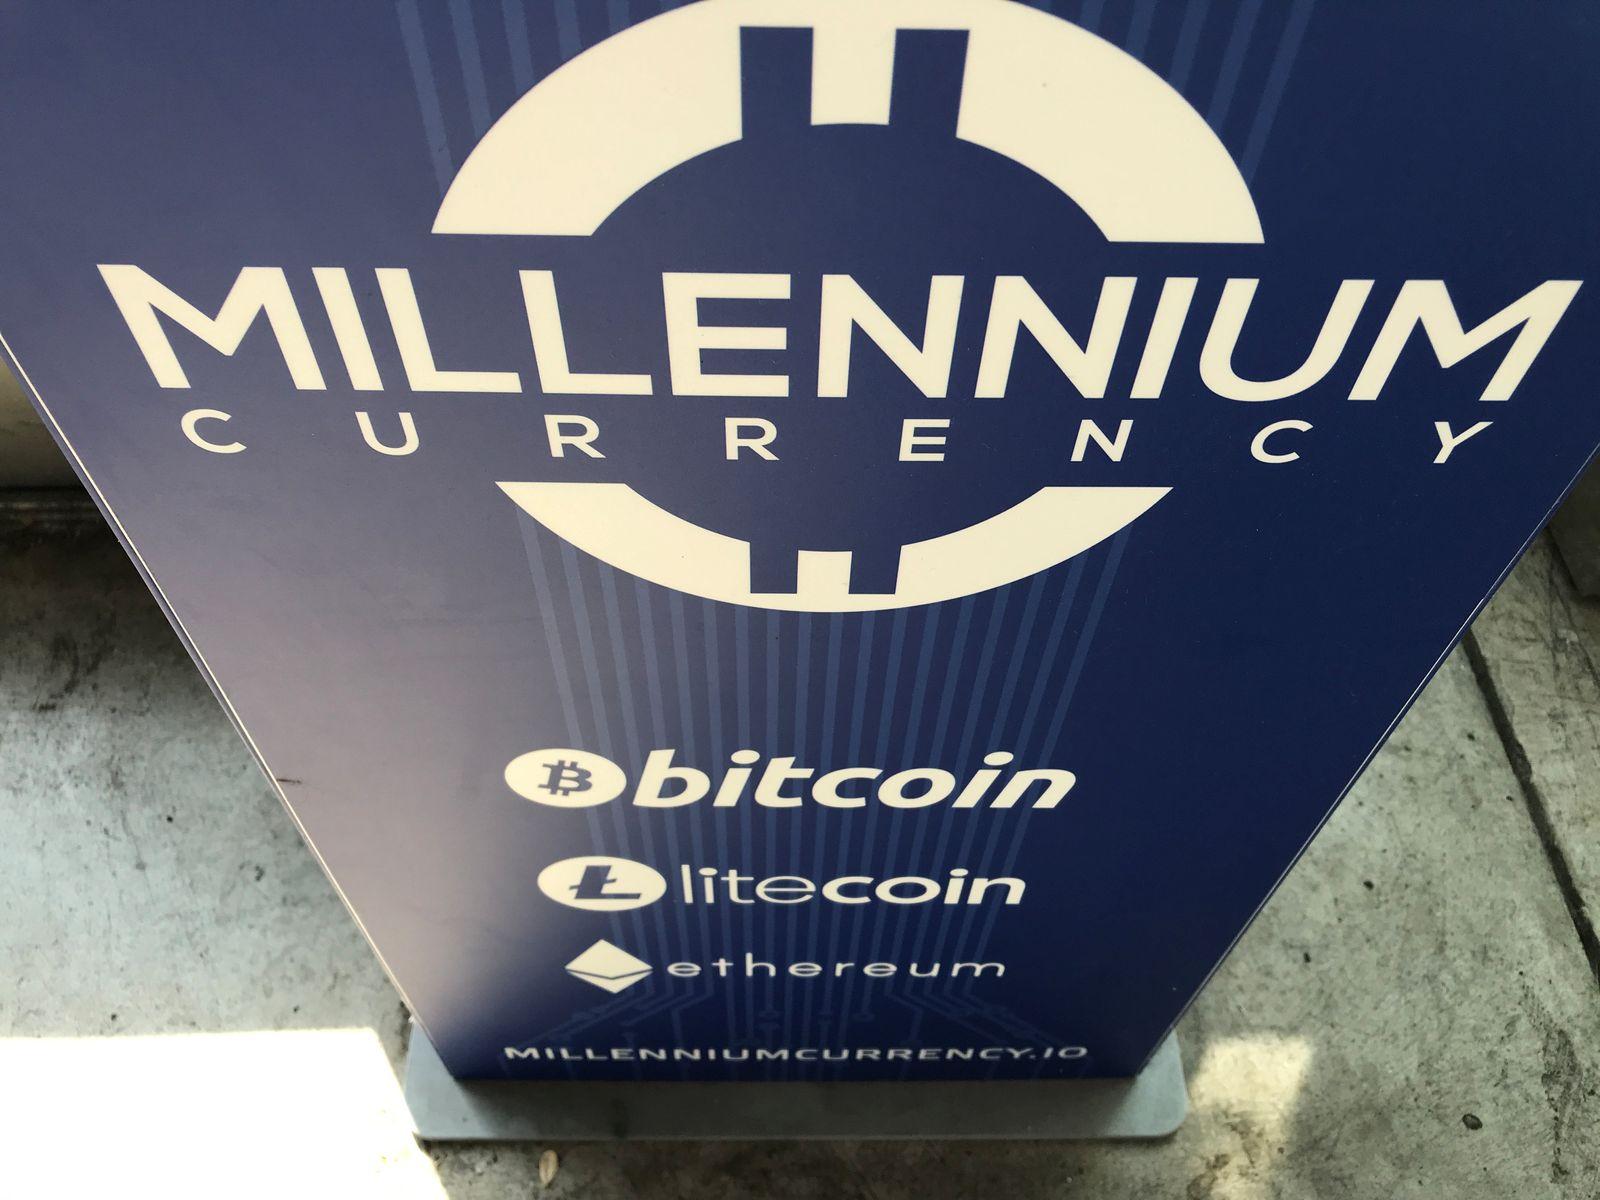 Bitcoin Etherum